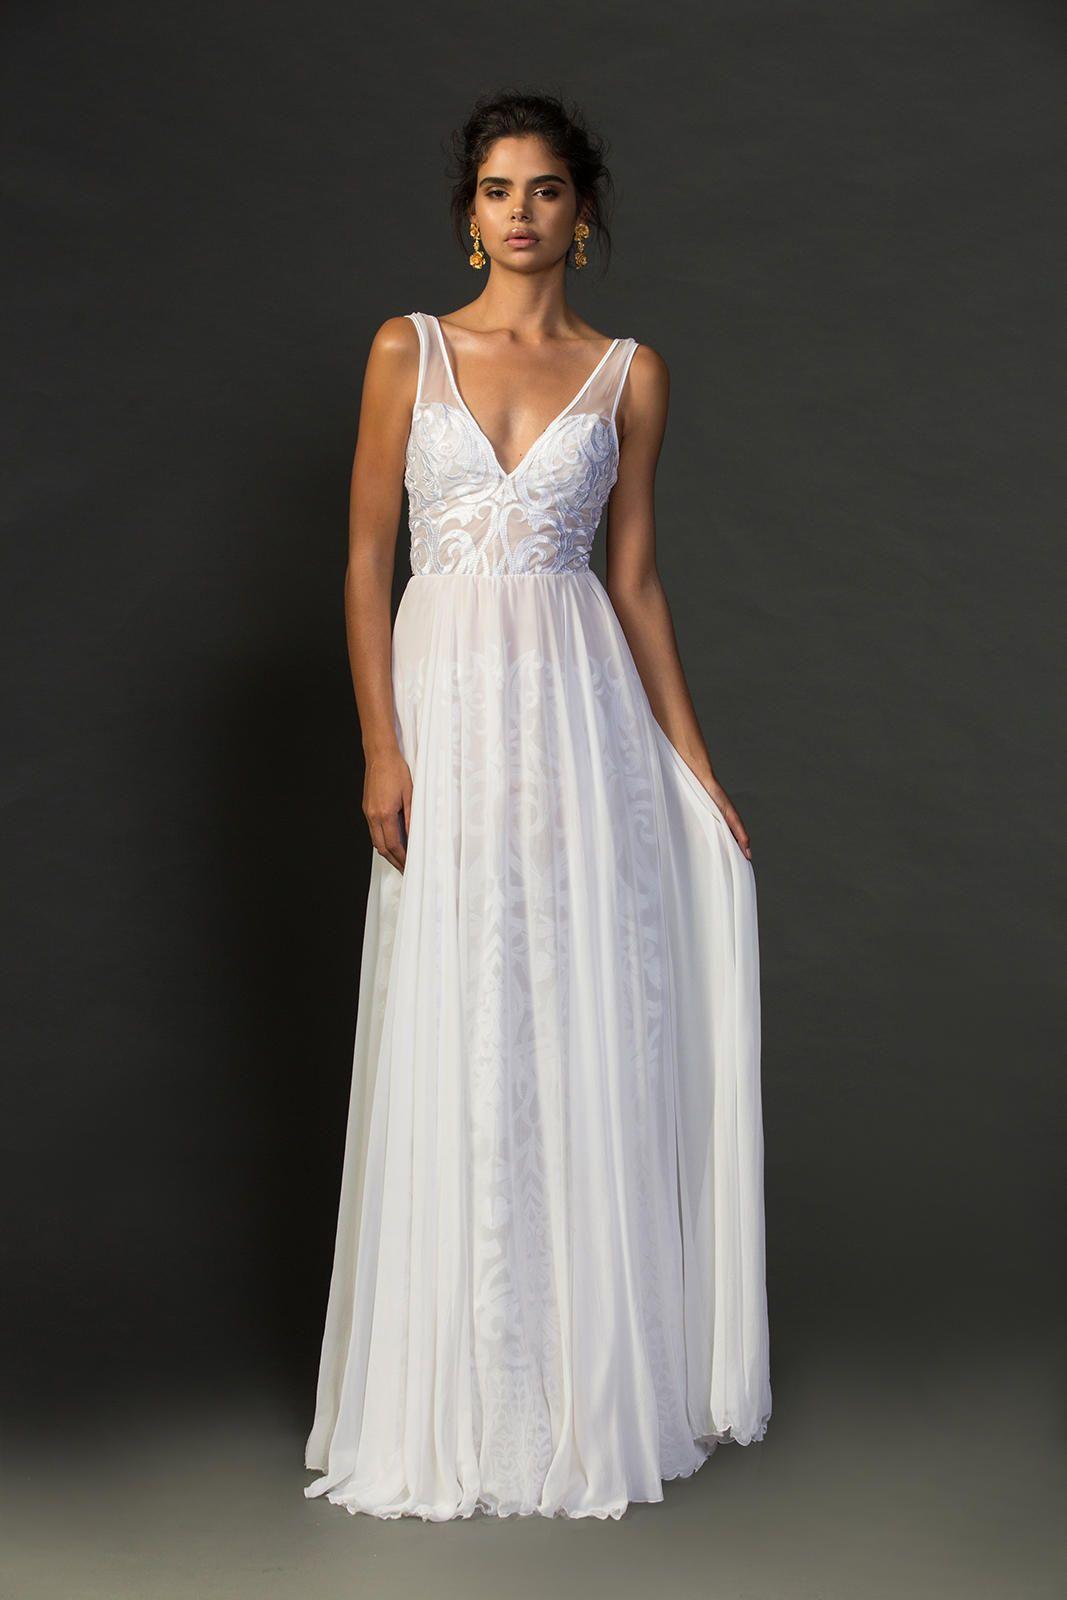 Sally dress grace loves lace dresses